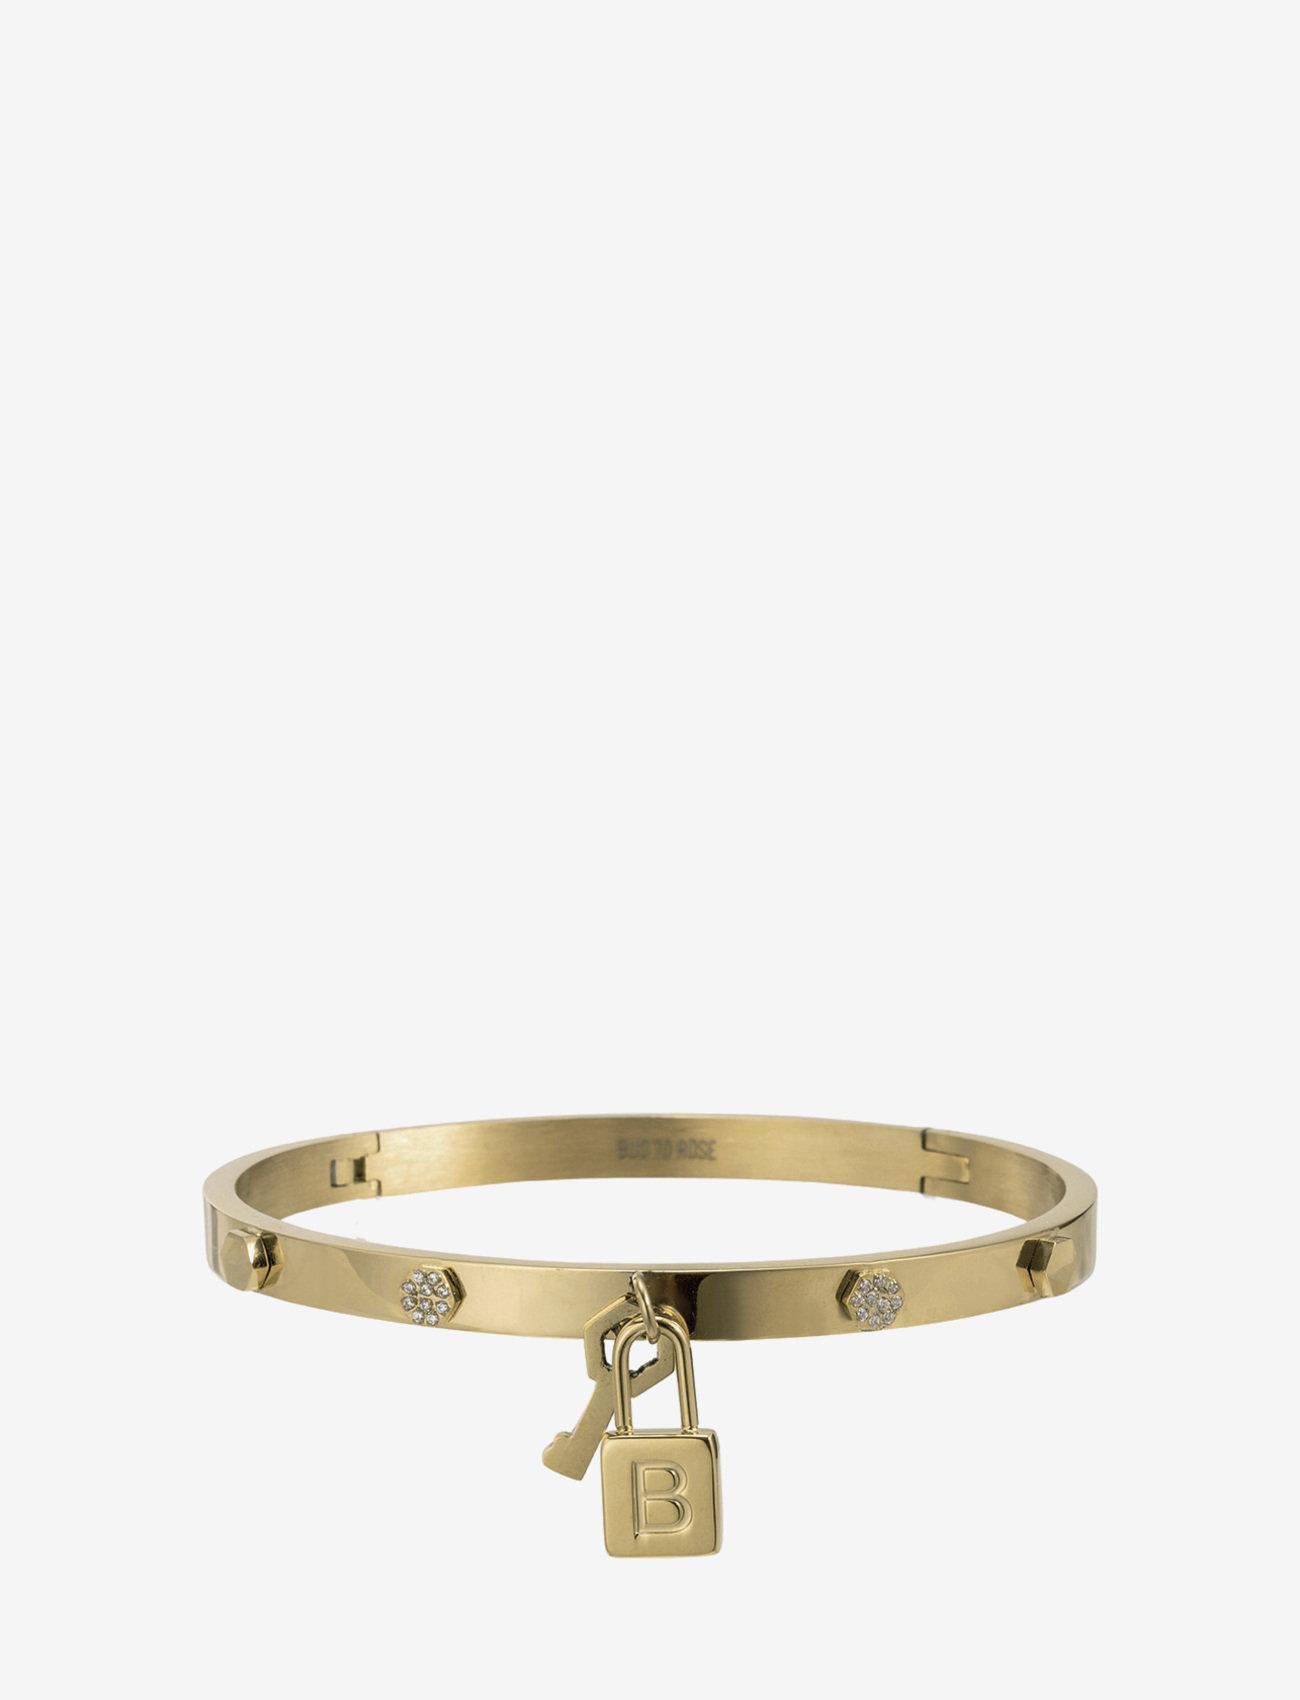 Bud to rose - Love Lock Bangle Steel - bangles - gold - 1